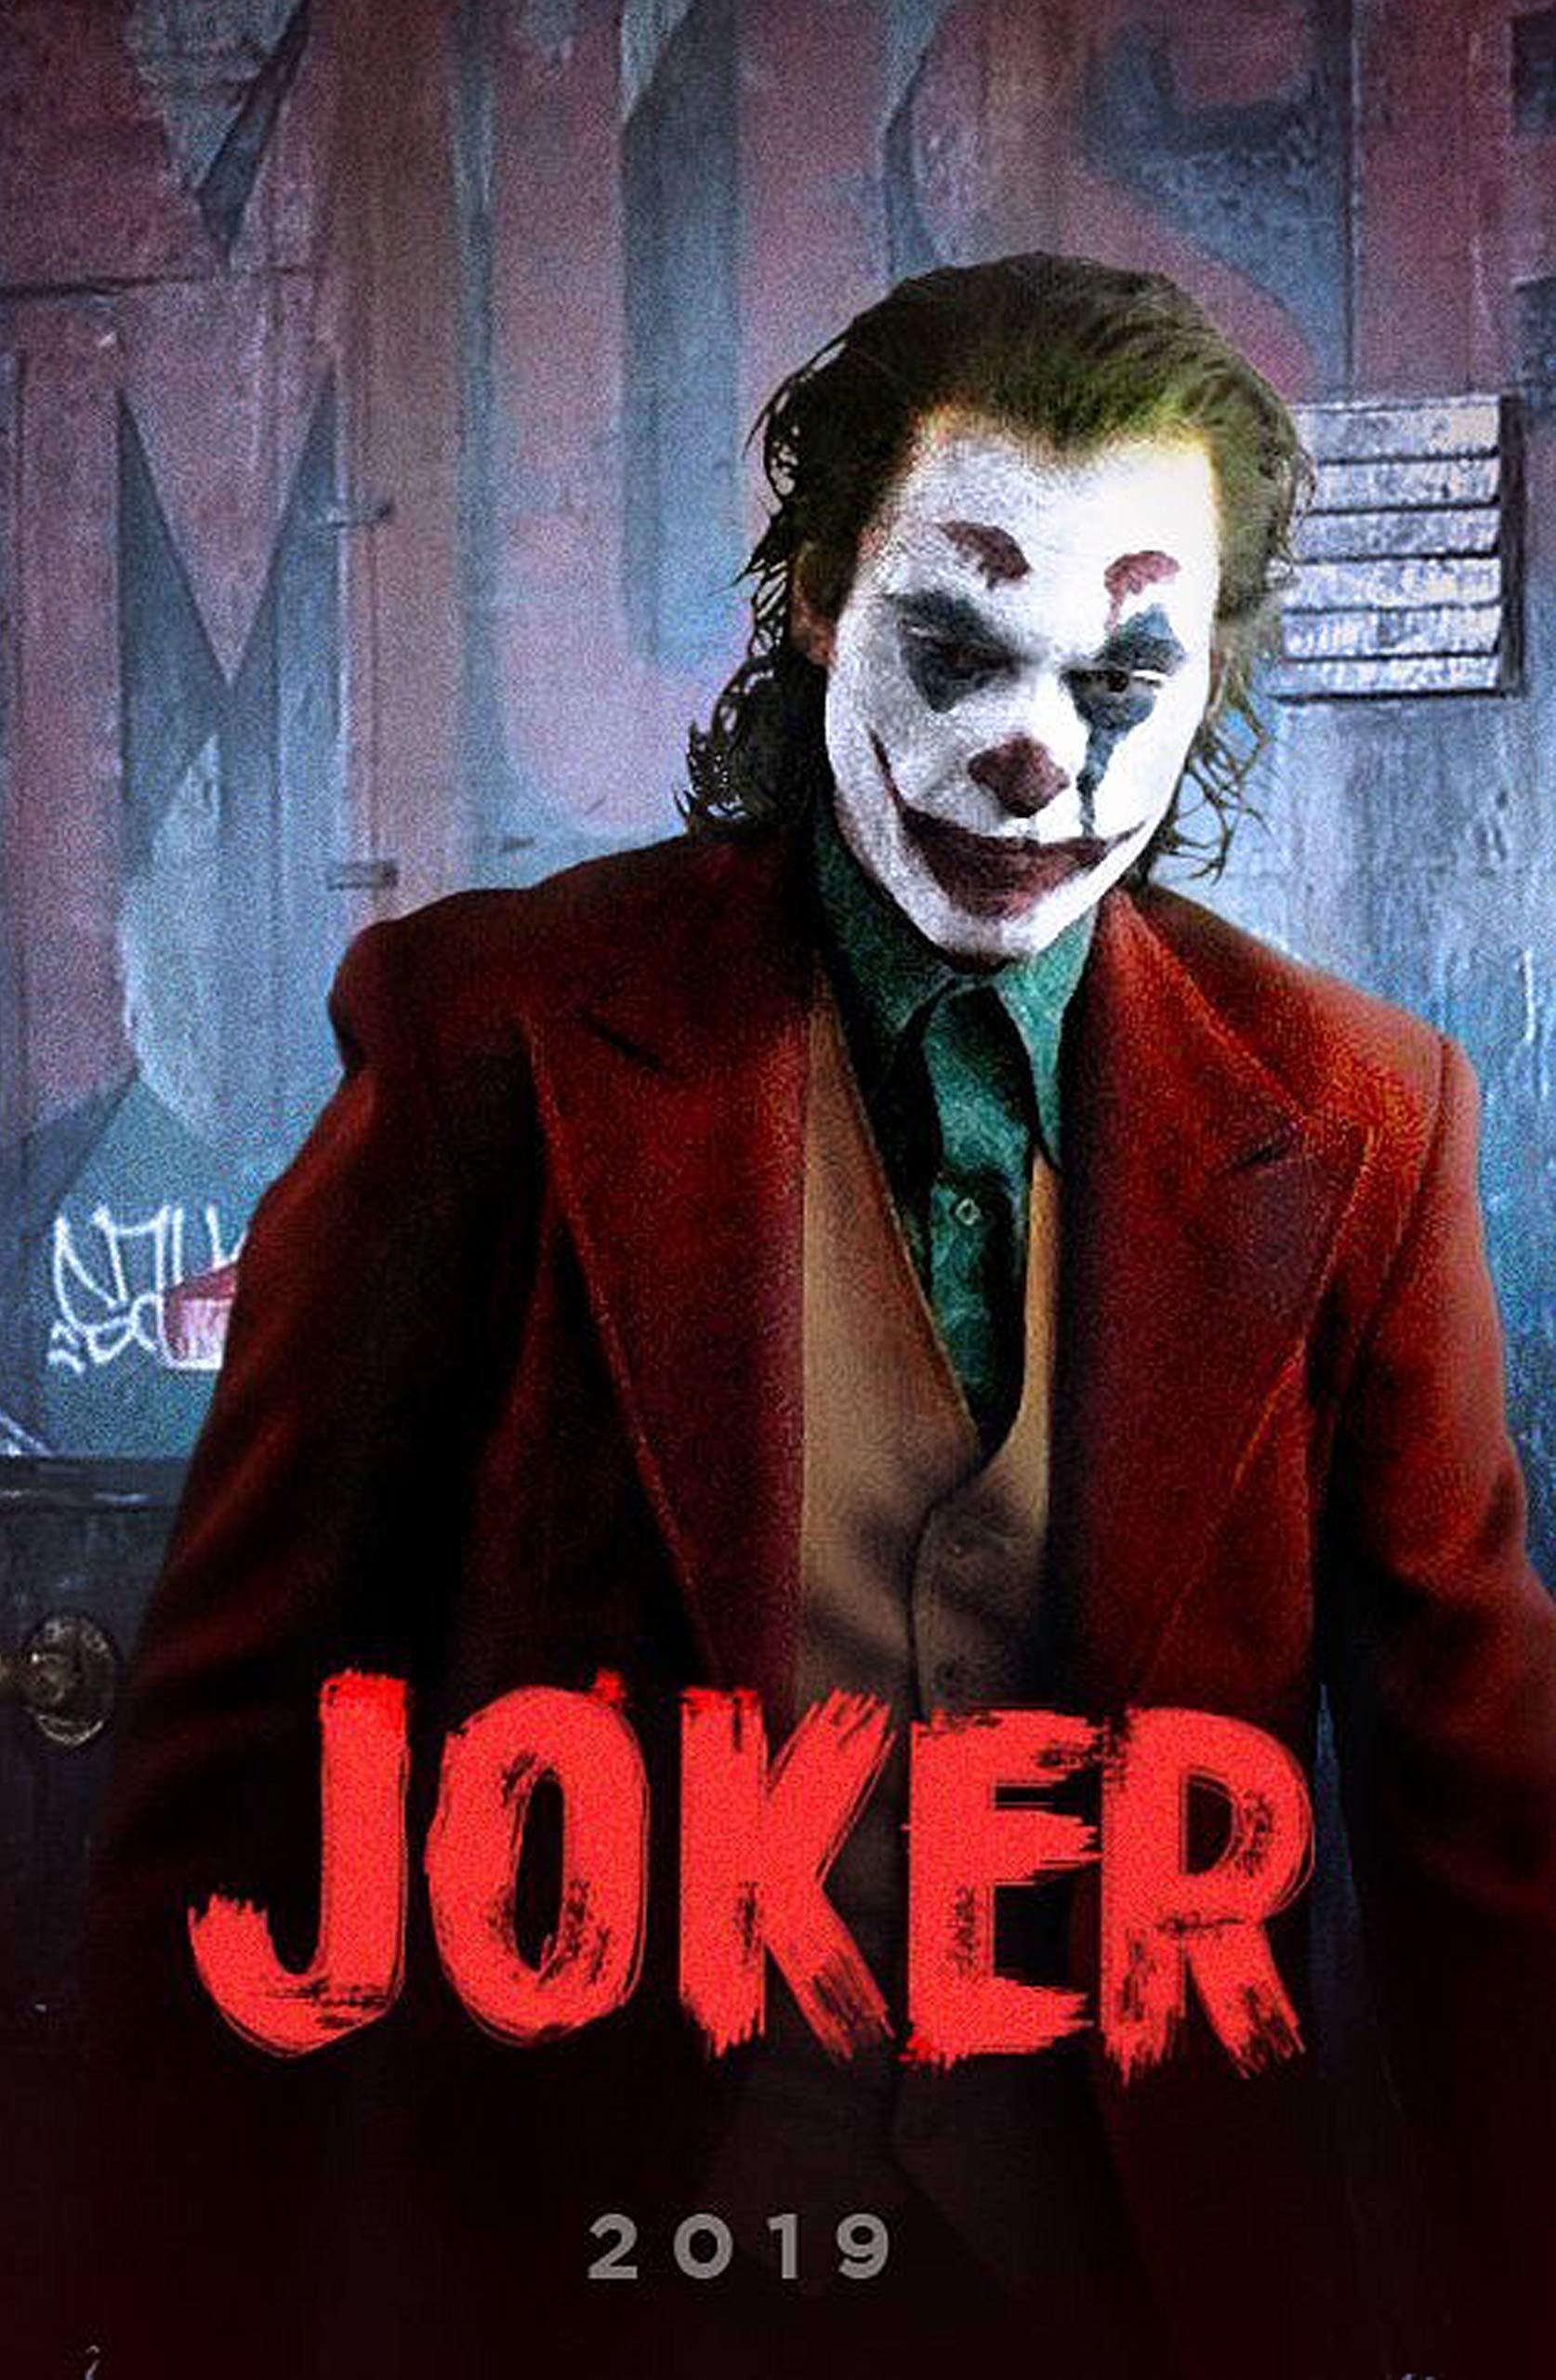 Joker: The Complete Screenplays